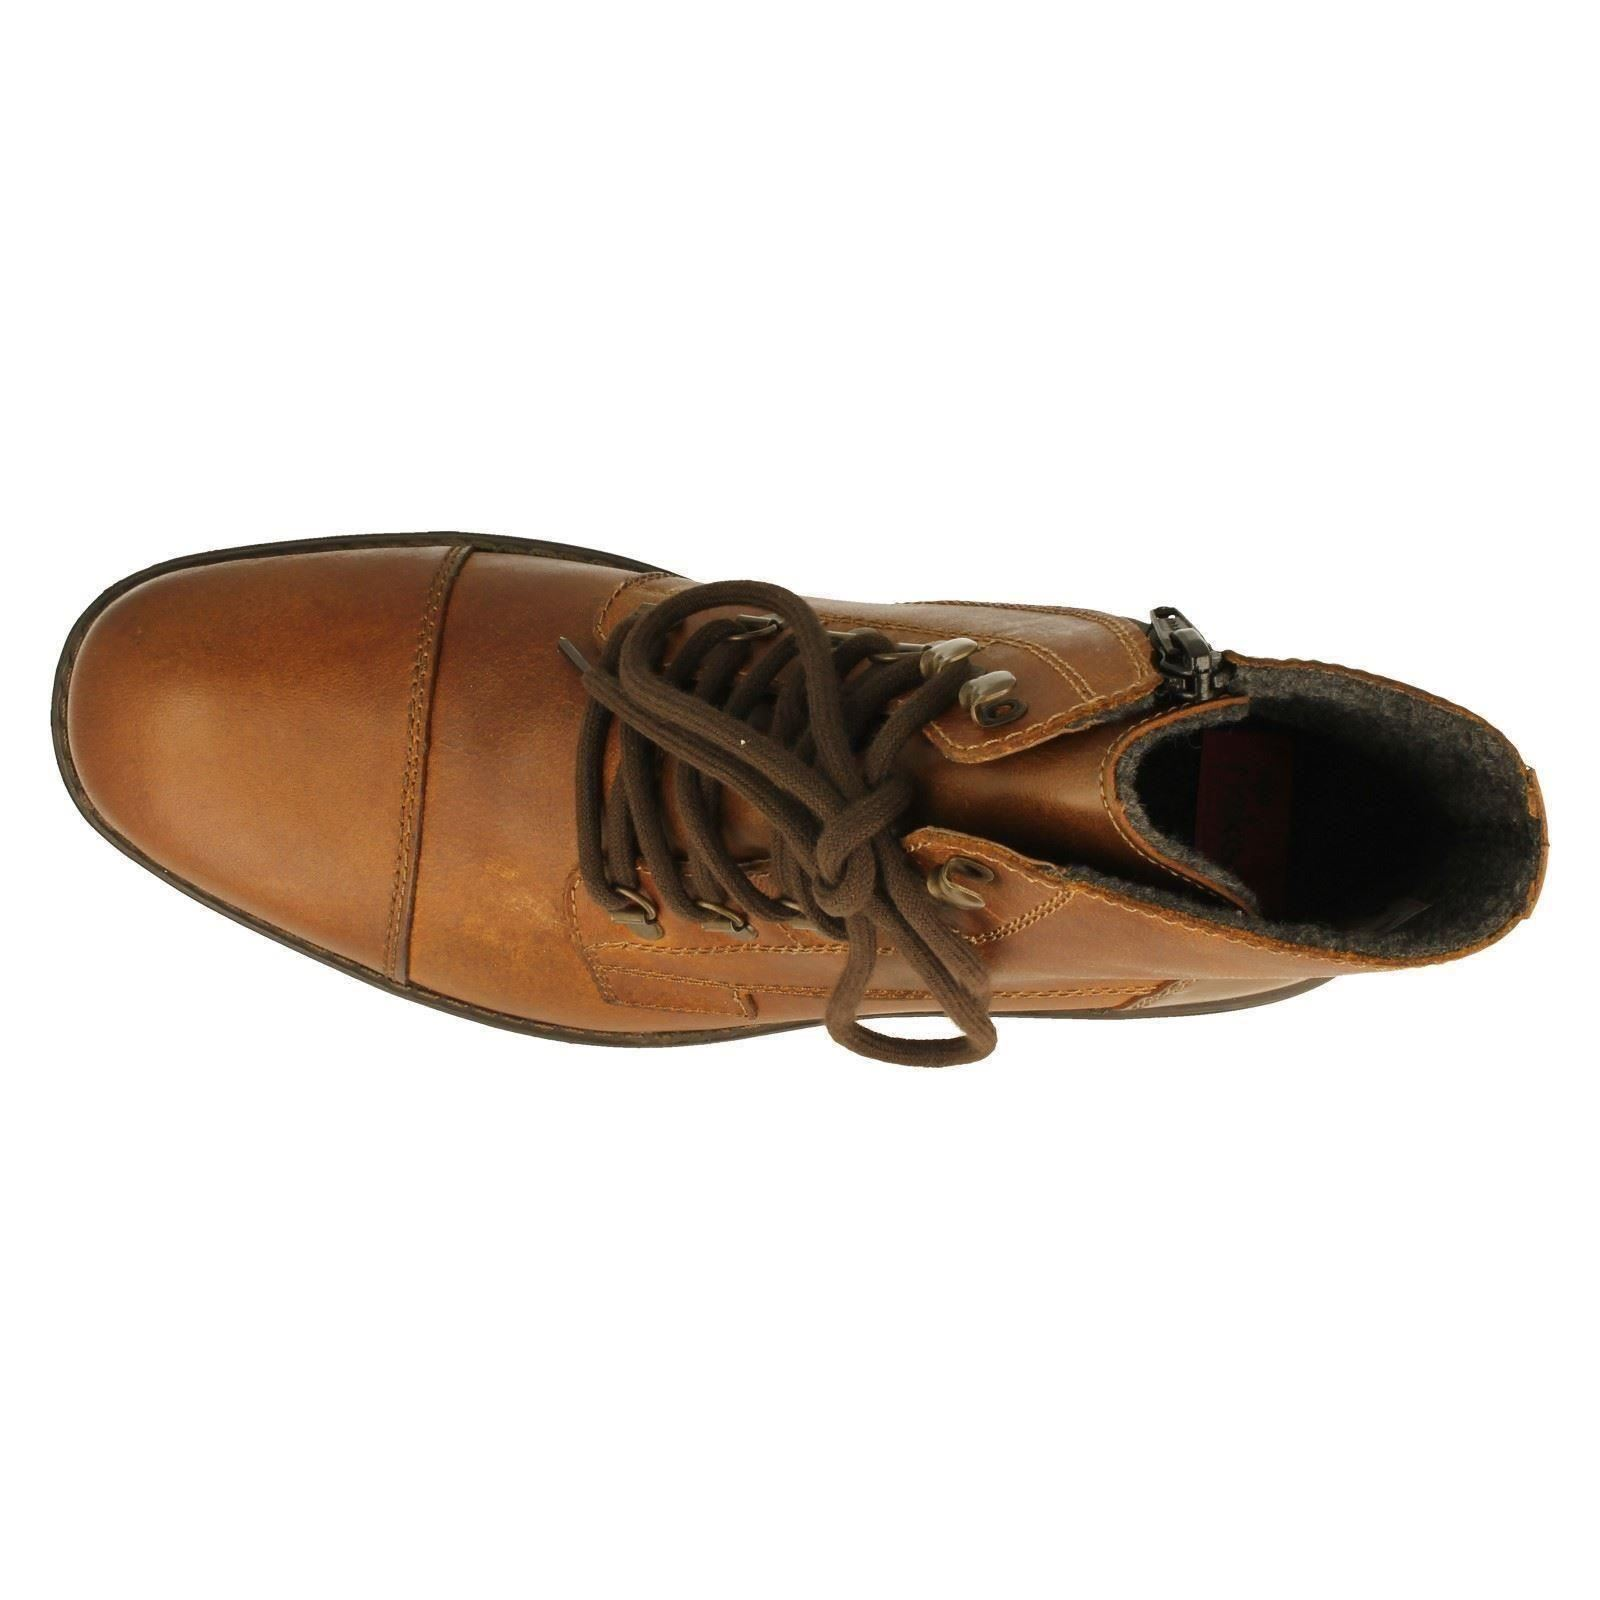 Botas para Hombre estilo Rieker estilo Hombre 33302-W 6bd571